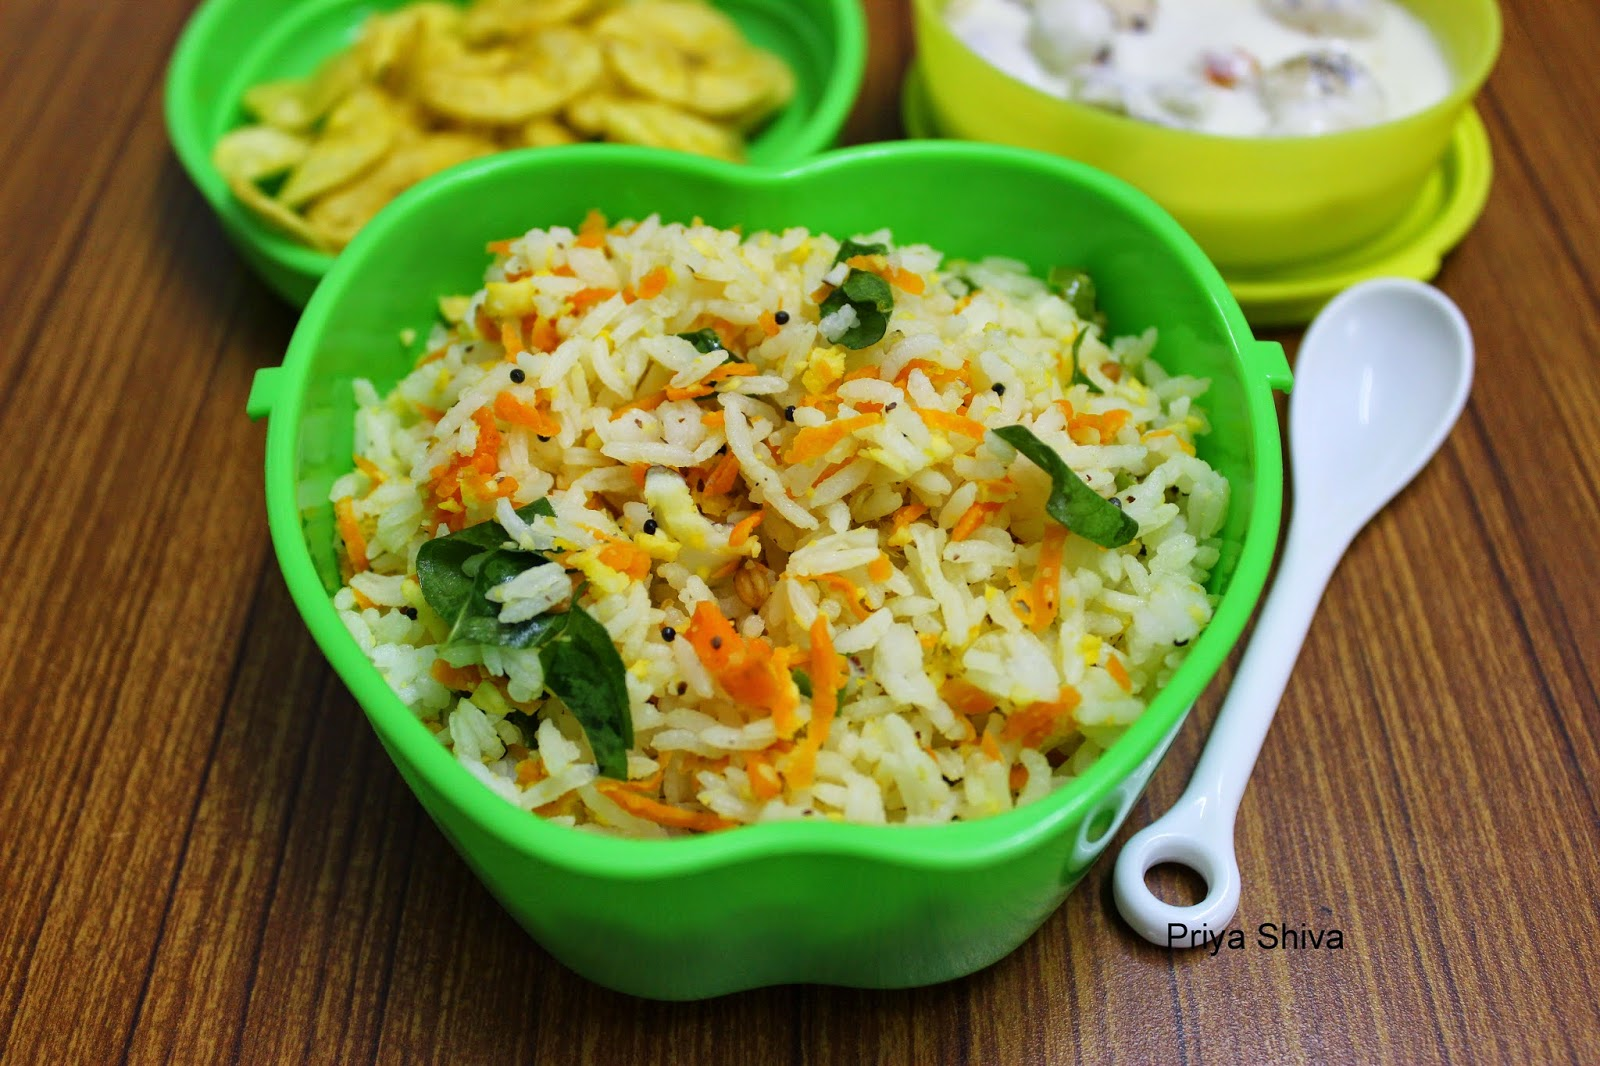 5 Indian style Vegan Recipes Created By Award Winning Priya Shiva-Carrot-Rice